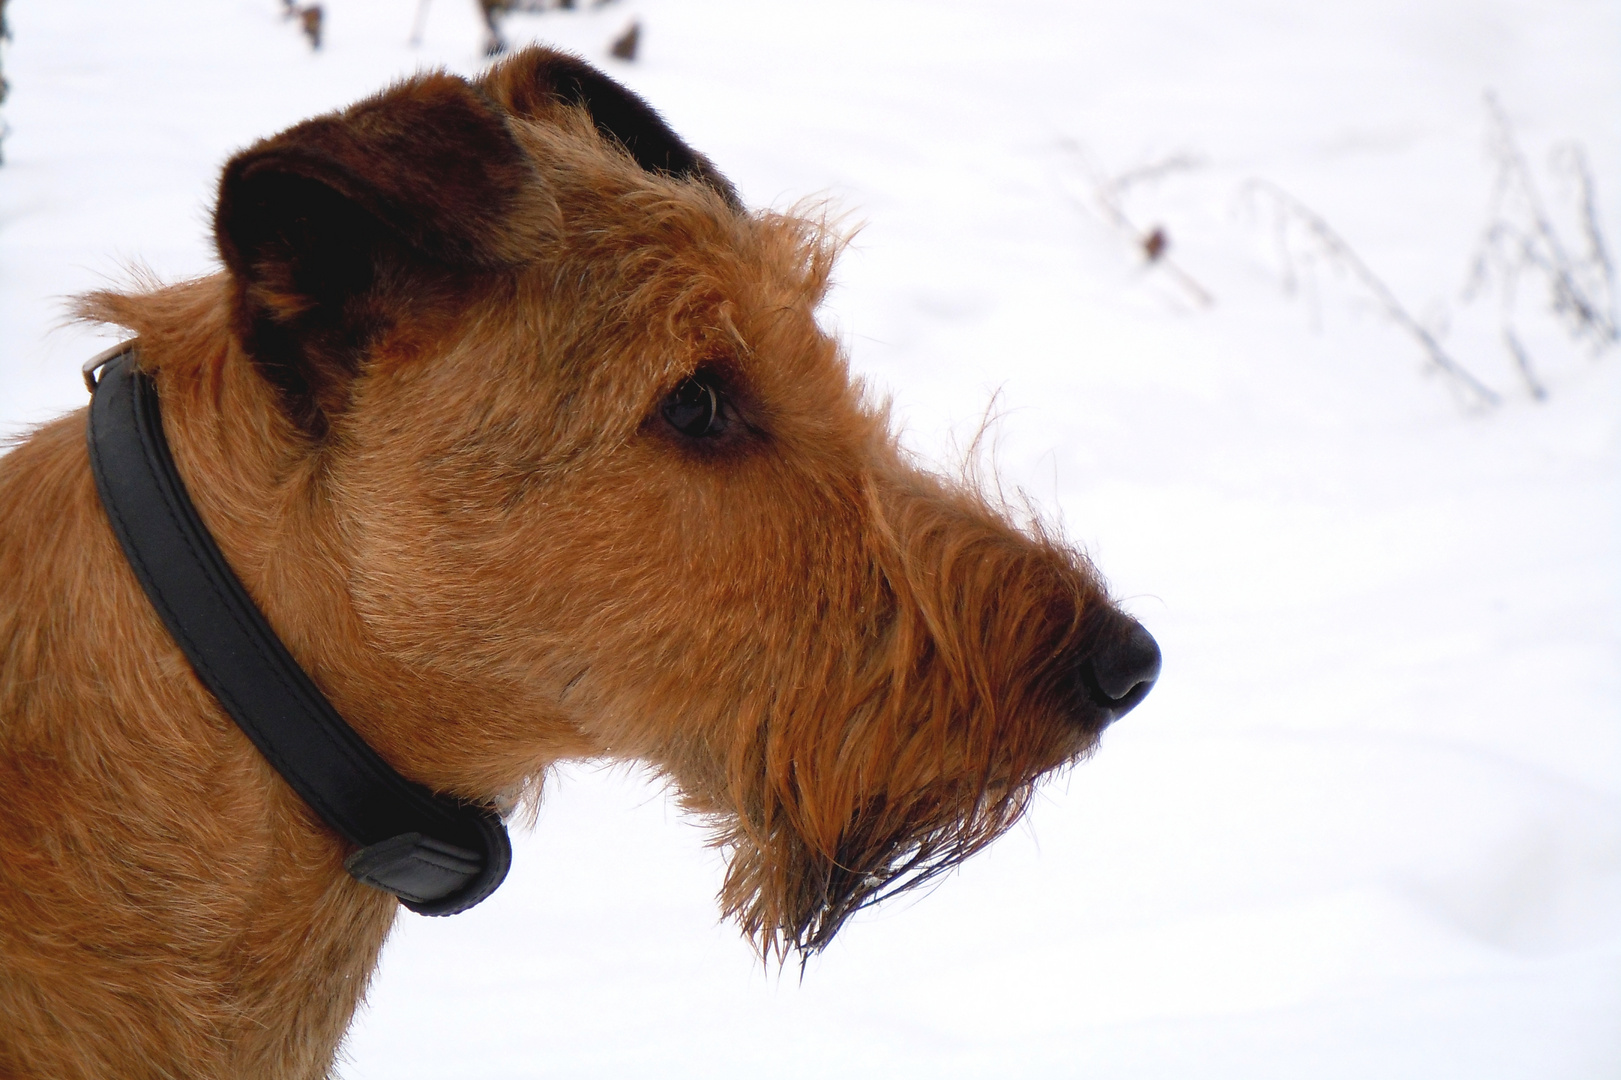 Paul im Schnee / 28.12.2010